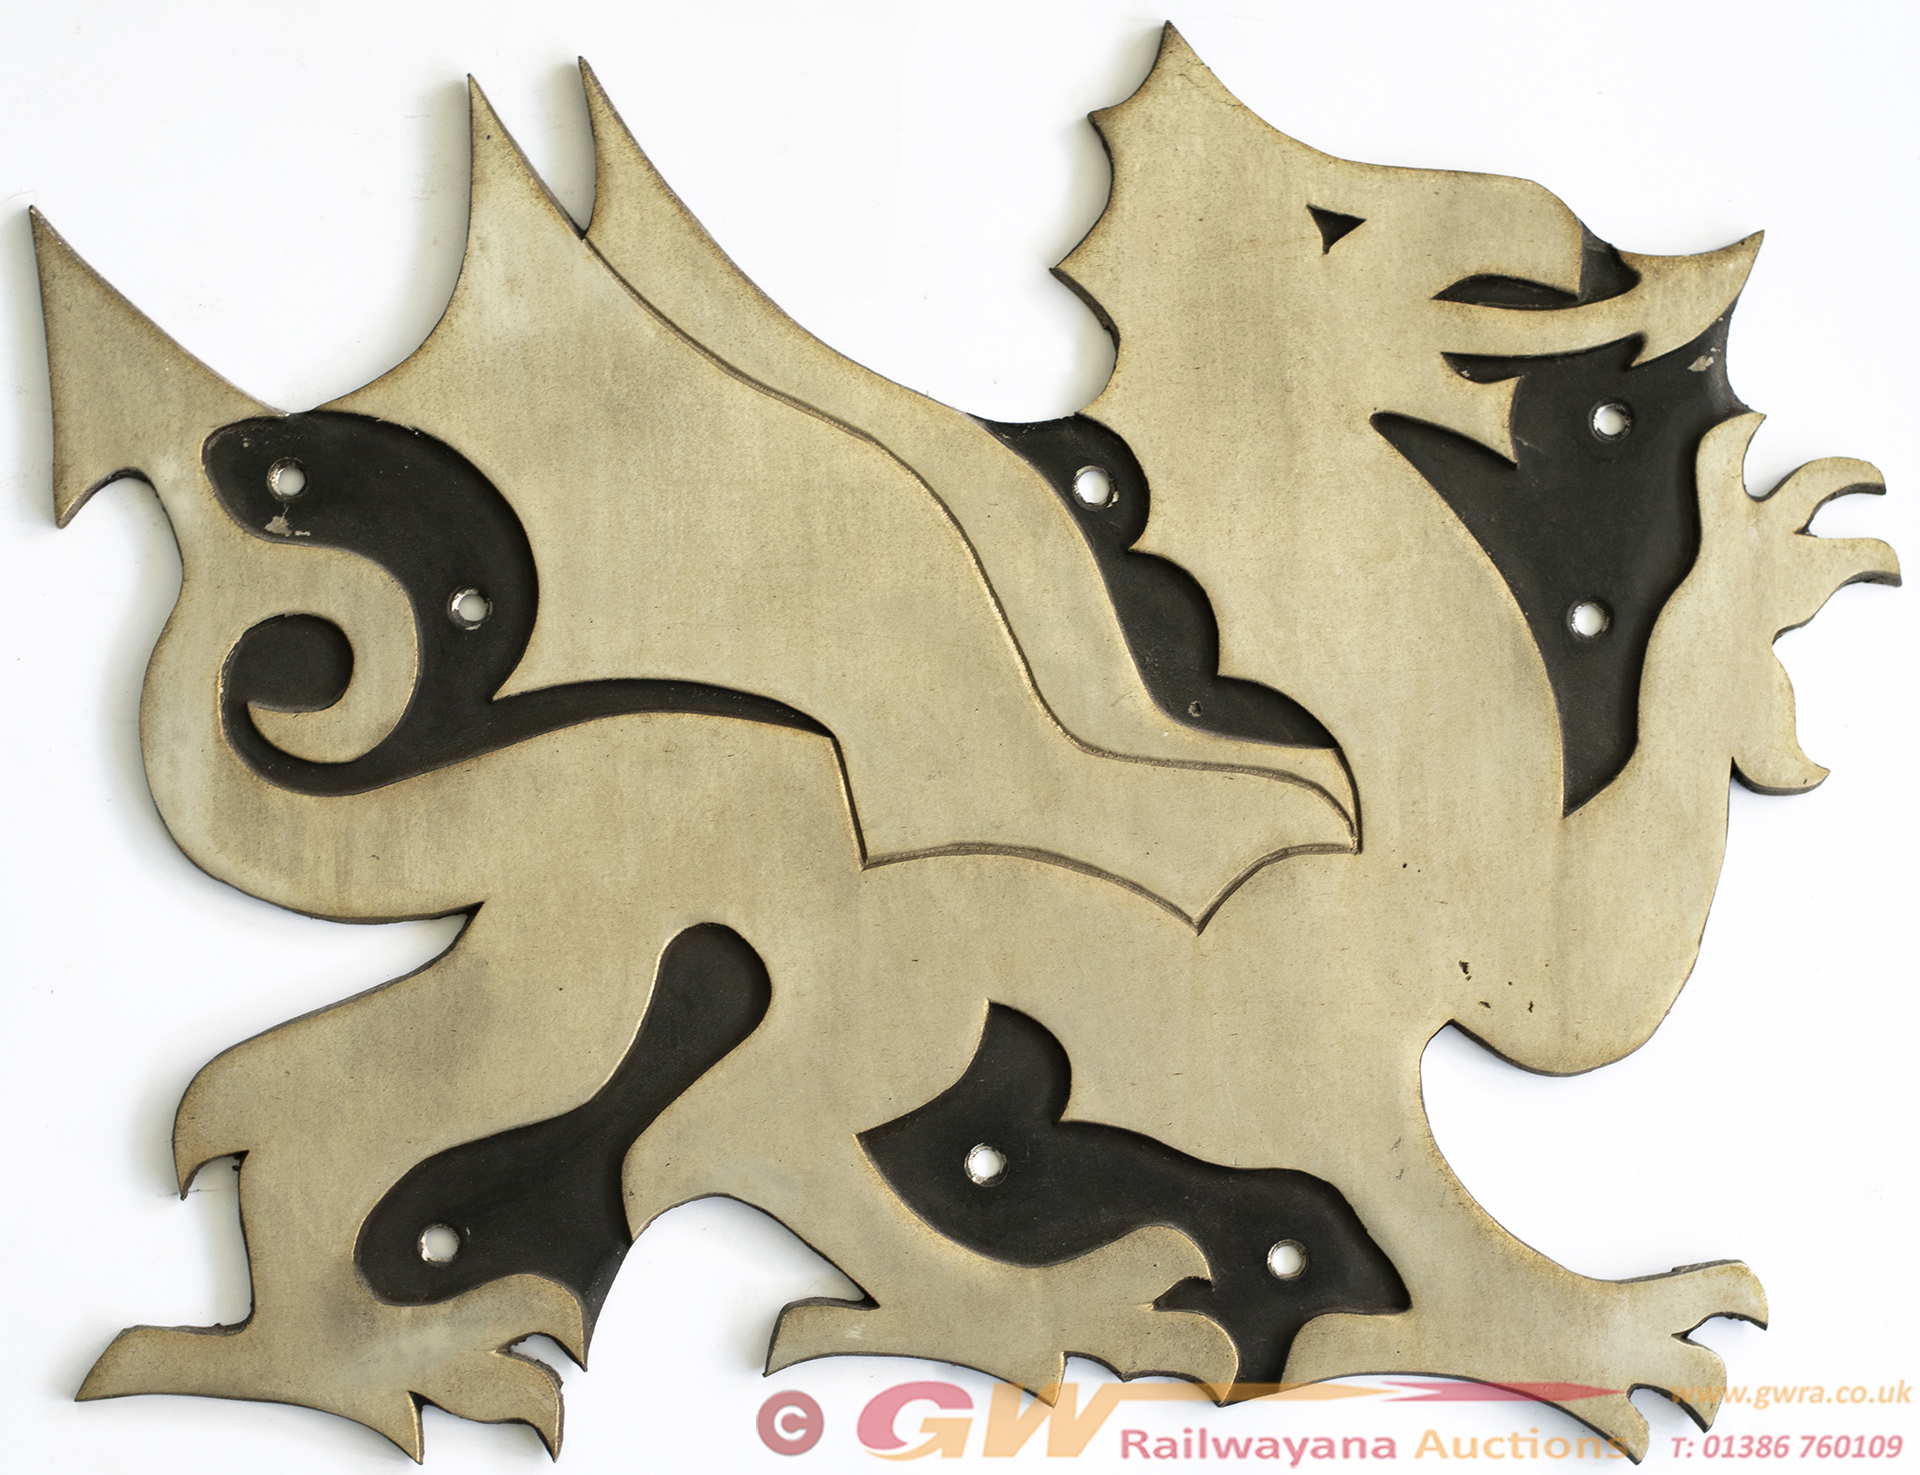 Fragonset Cast Aluminium Wyvern Logo Carried By